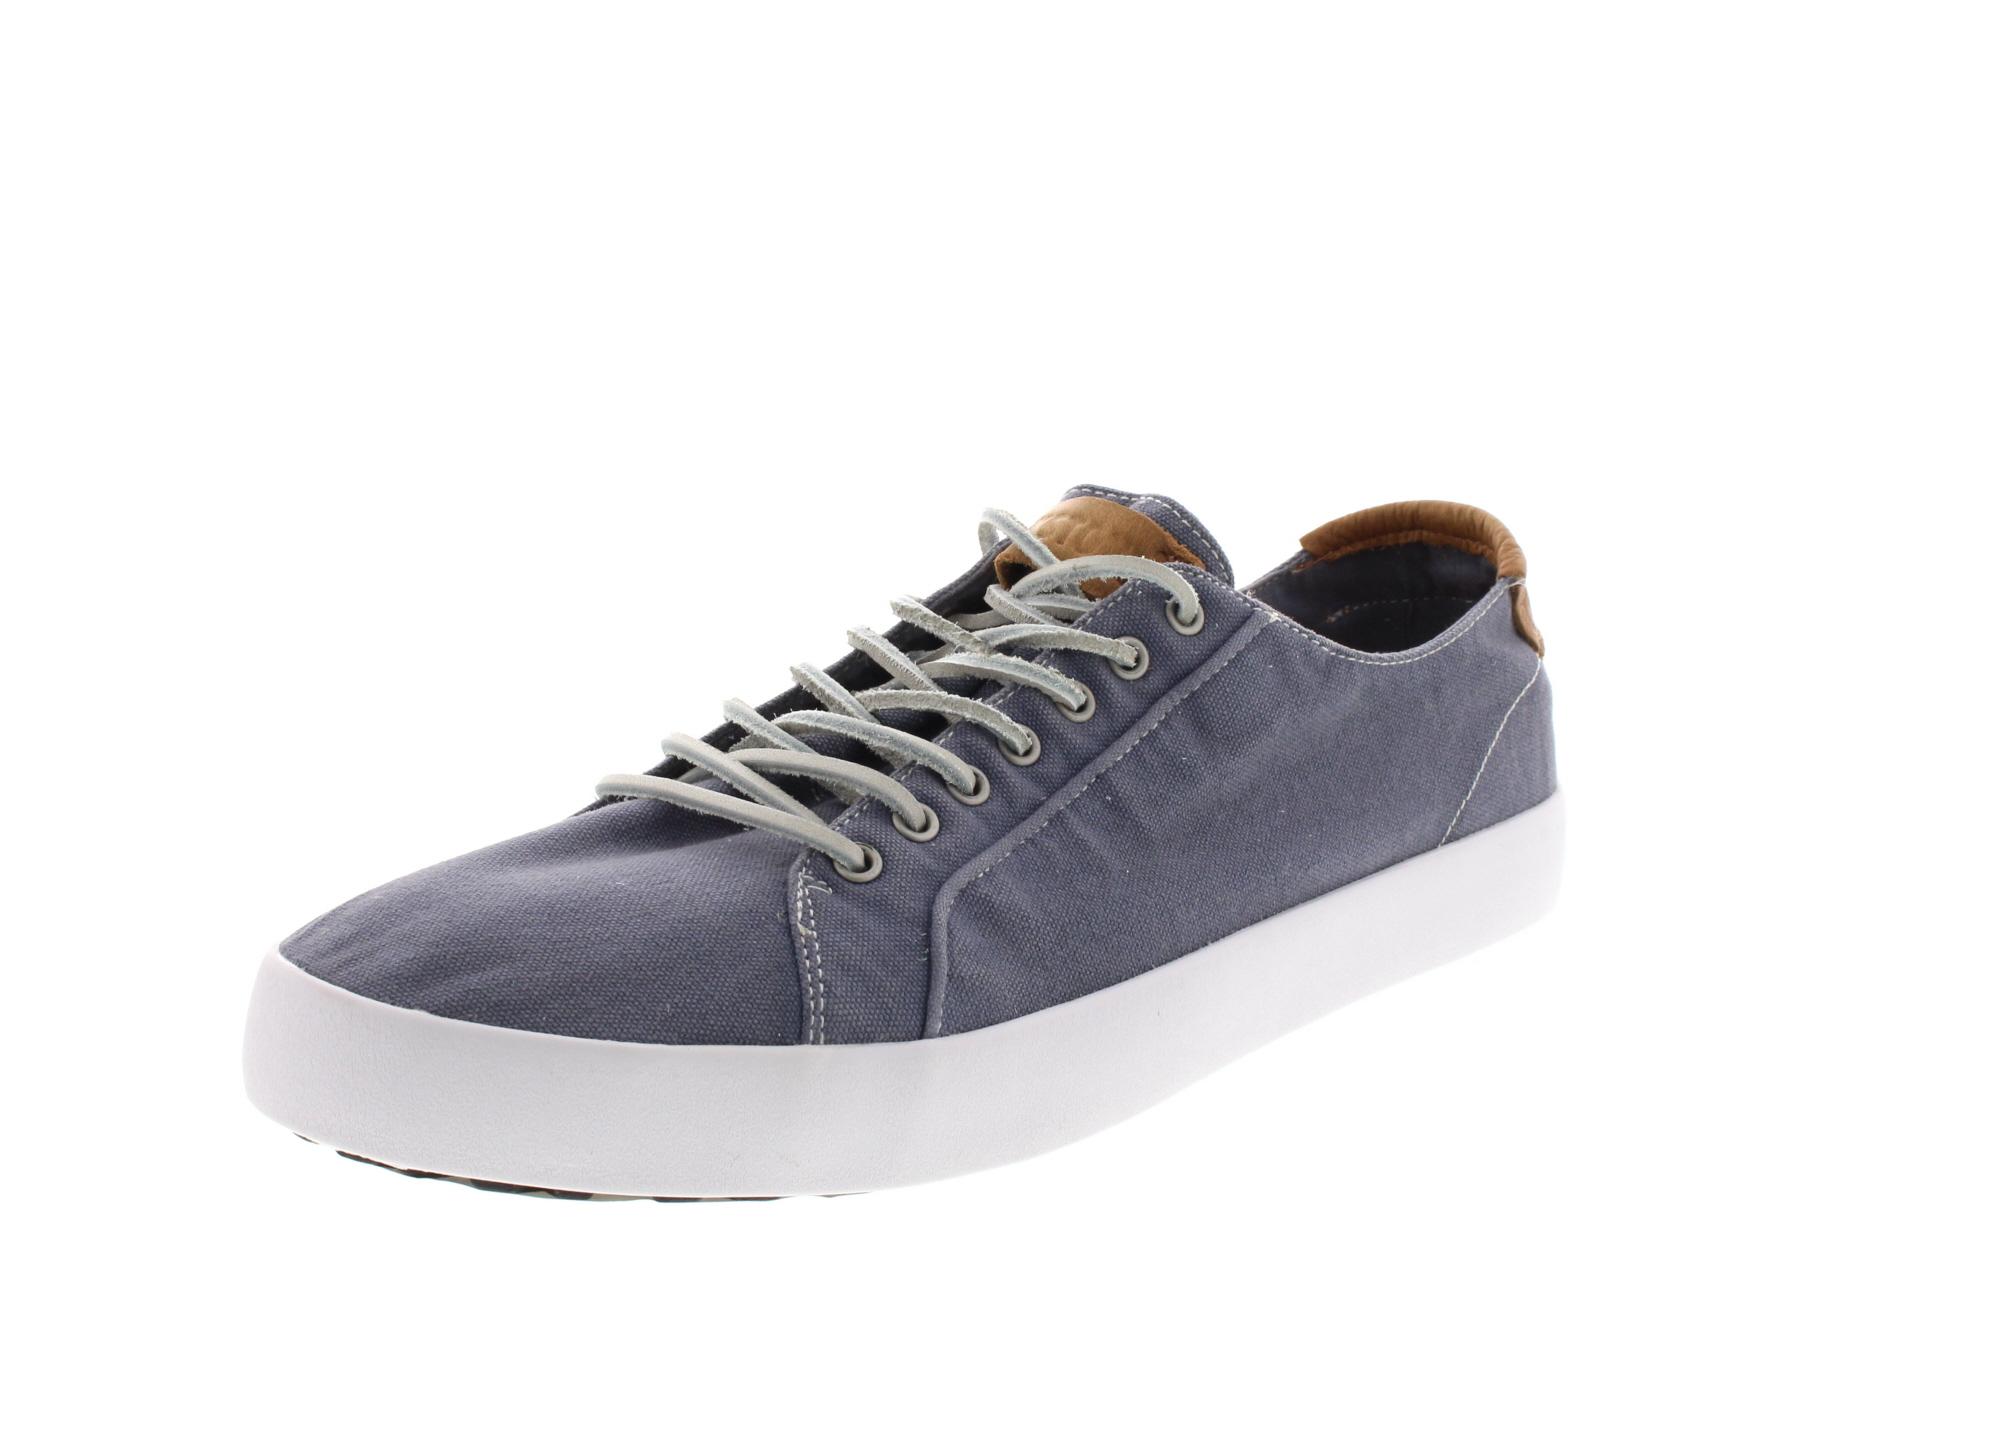 BLACKSTONE in Übergröße - Sneakers NM95 - indigo